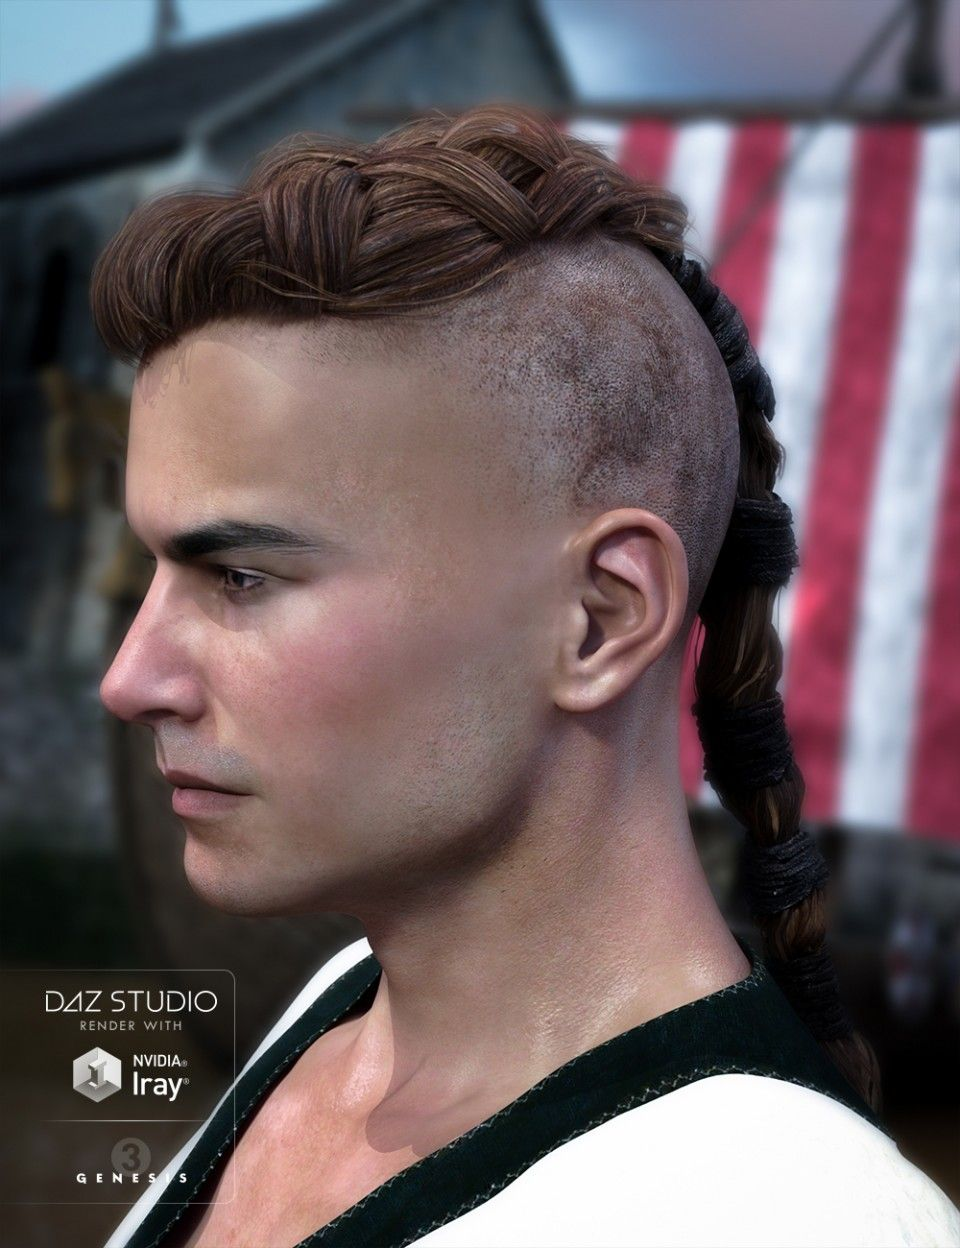 Viking Hair For Genesis 3 Male S Viking Hair Womens Hairstyles Hair Styles